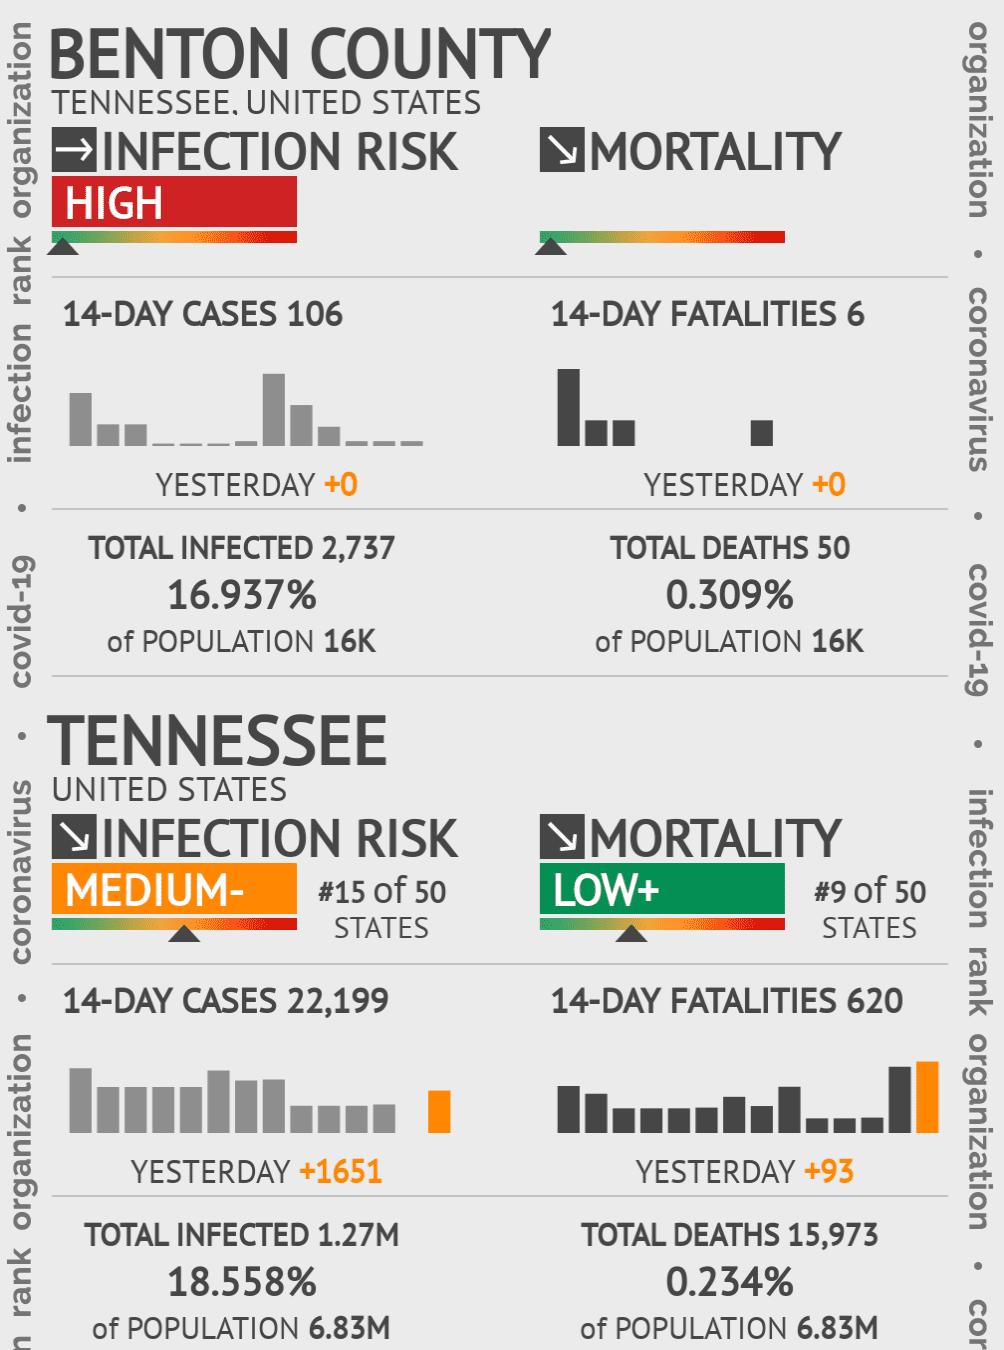 Benton County Coronavirus Covid-19 Risk of Infection on March 05, 2021